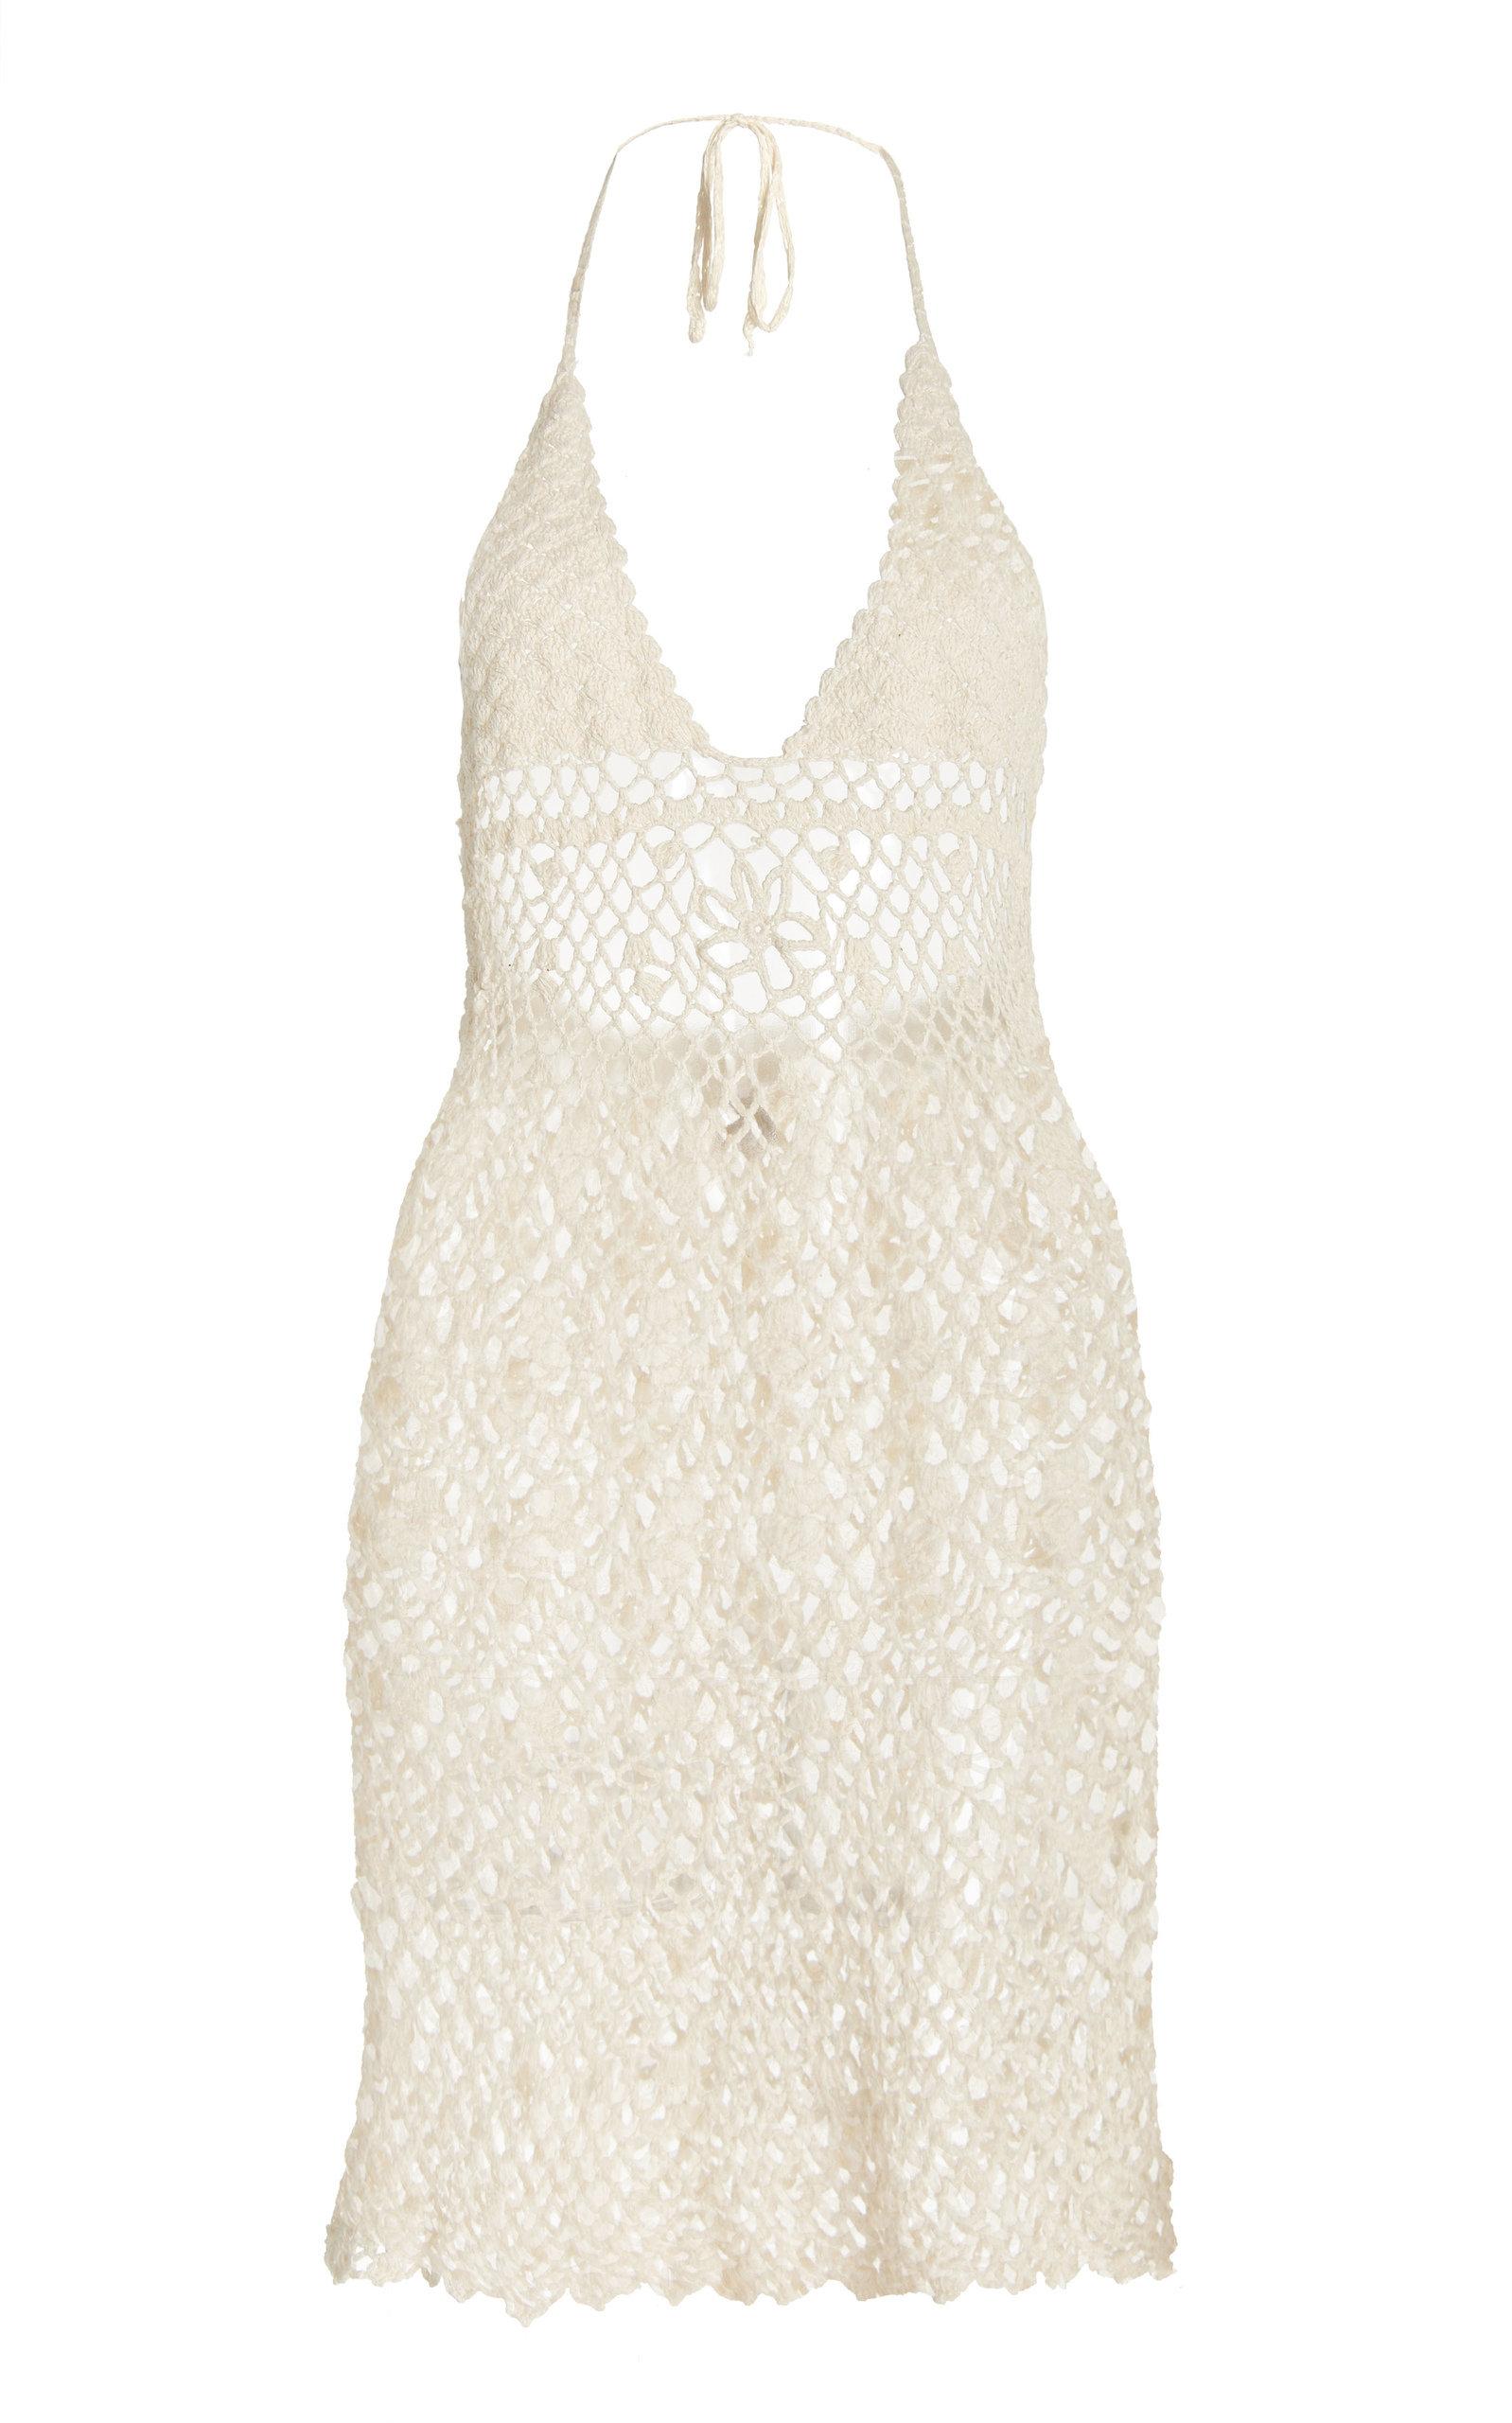 Women's Jepun Crocheted Cotton Mini Dress